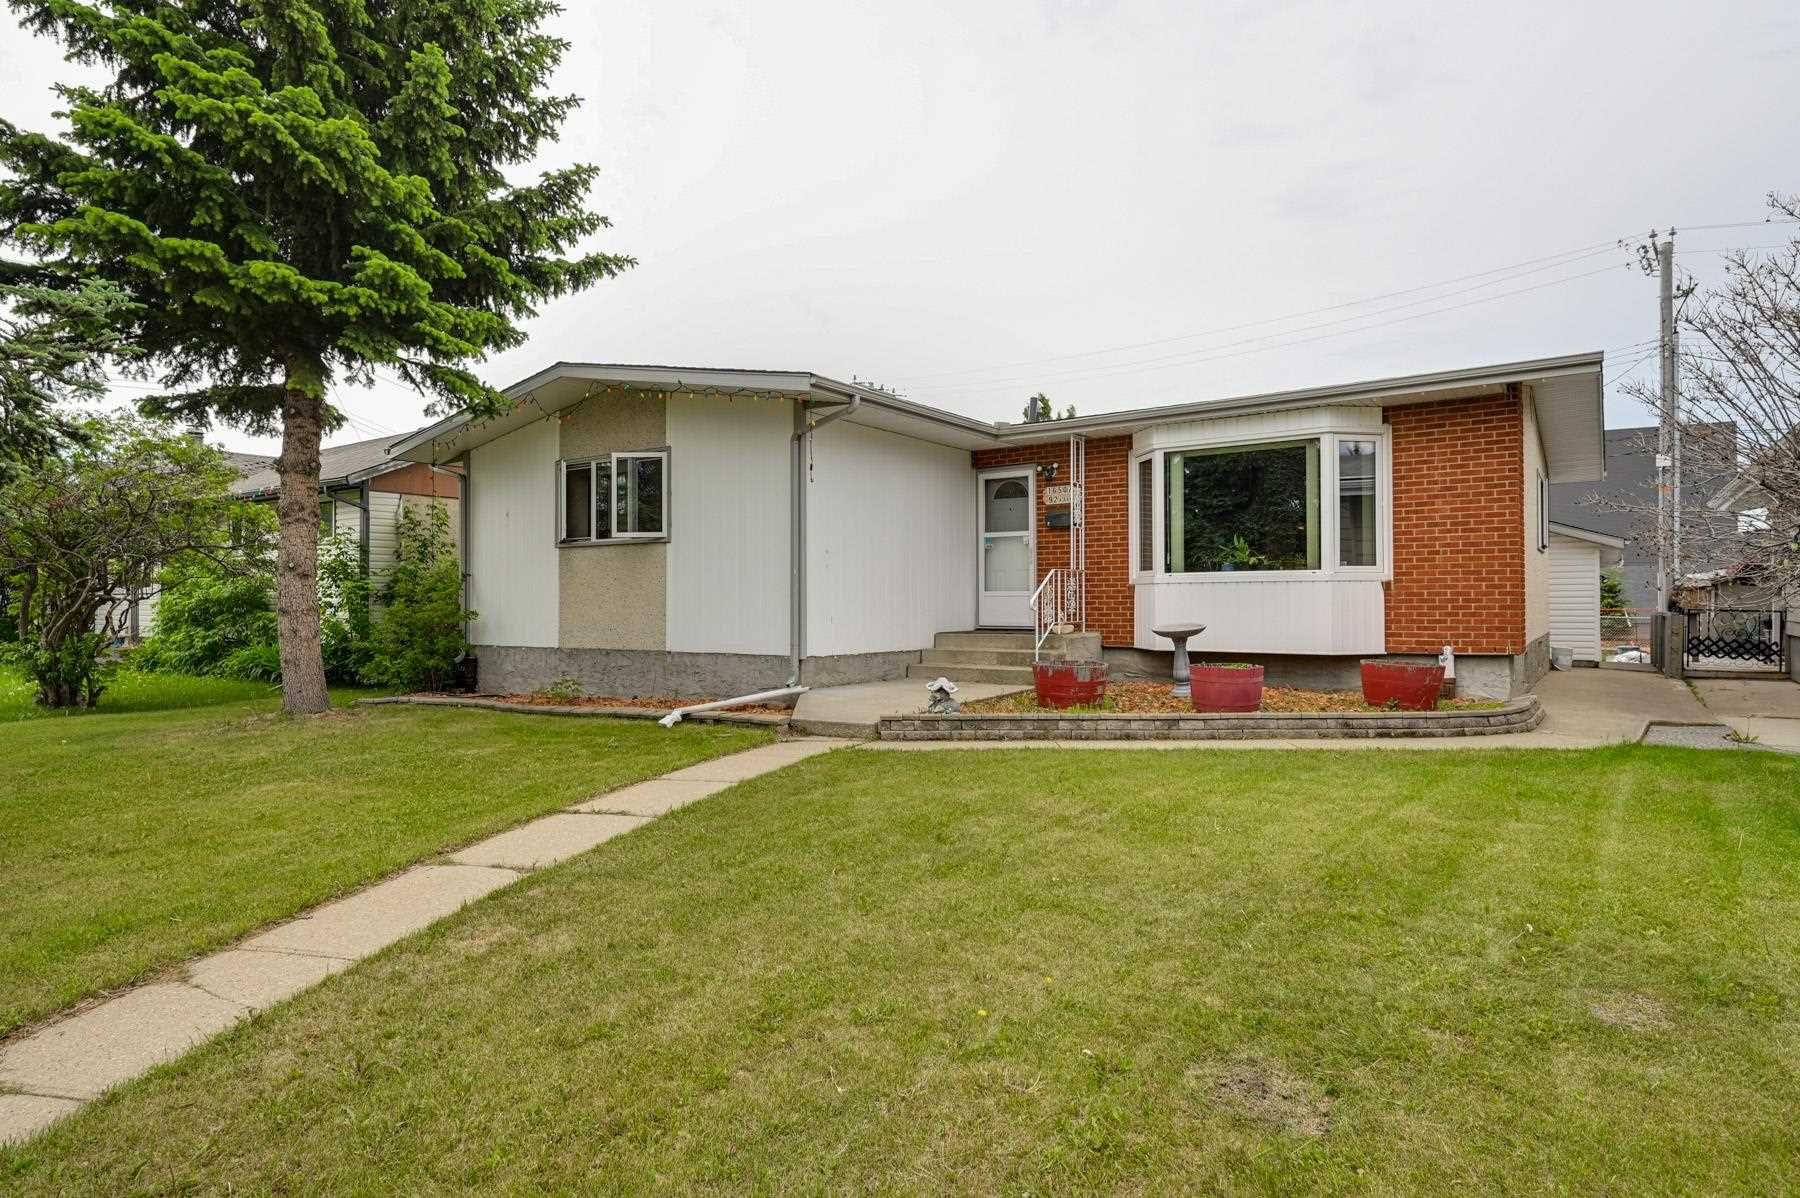 Main Photo: 16507 92A Avenue in Edmonton: Zone 22 House for sale : MLS®# E4250314